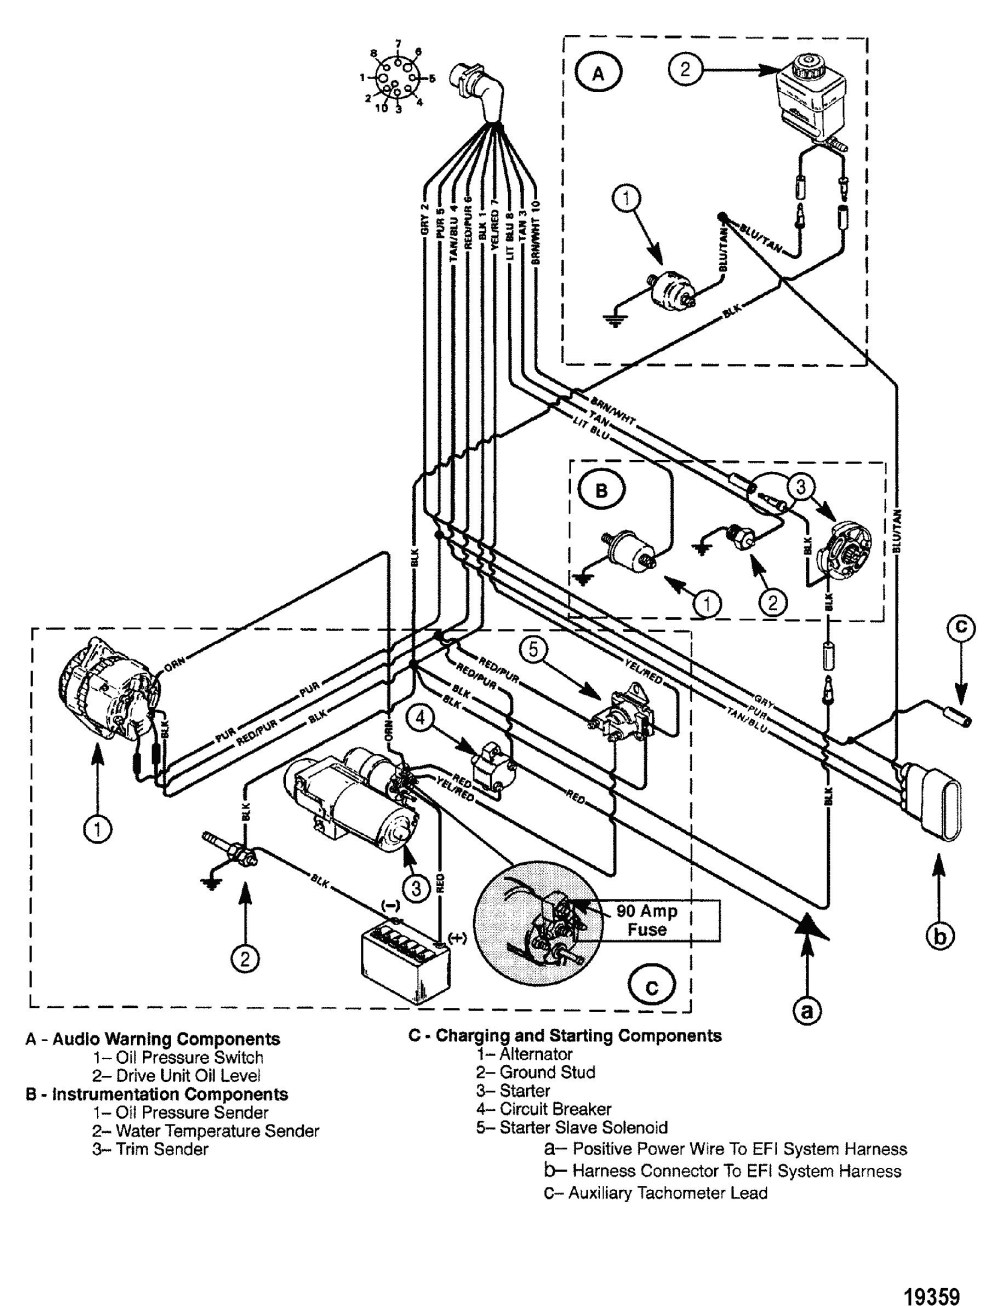 medium resolution of starcraft boat diagram circuit diagram symbols source 4 3 vortec mercruiser wiring diagram schematics wiring